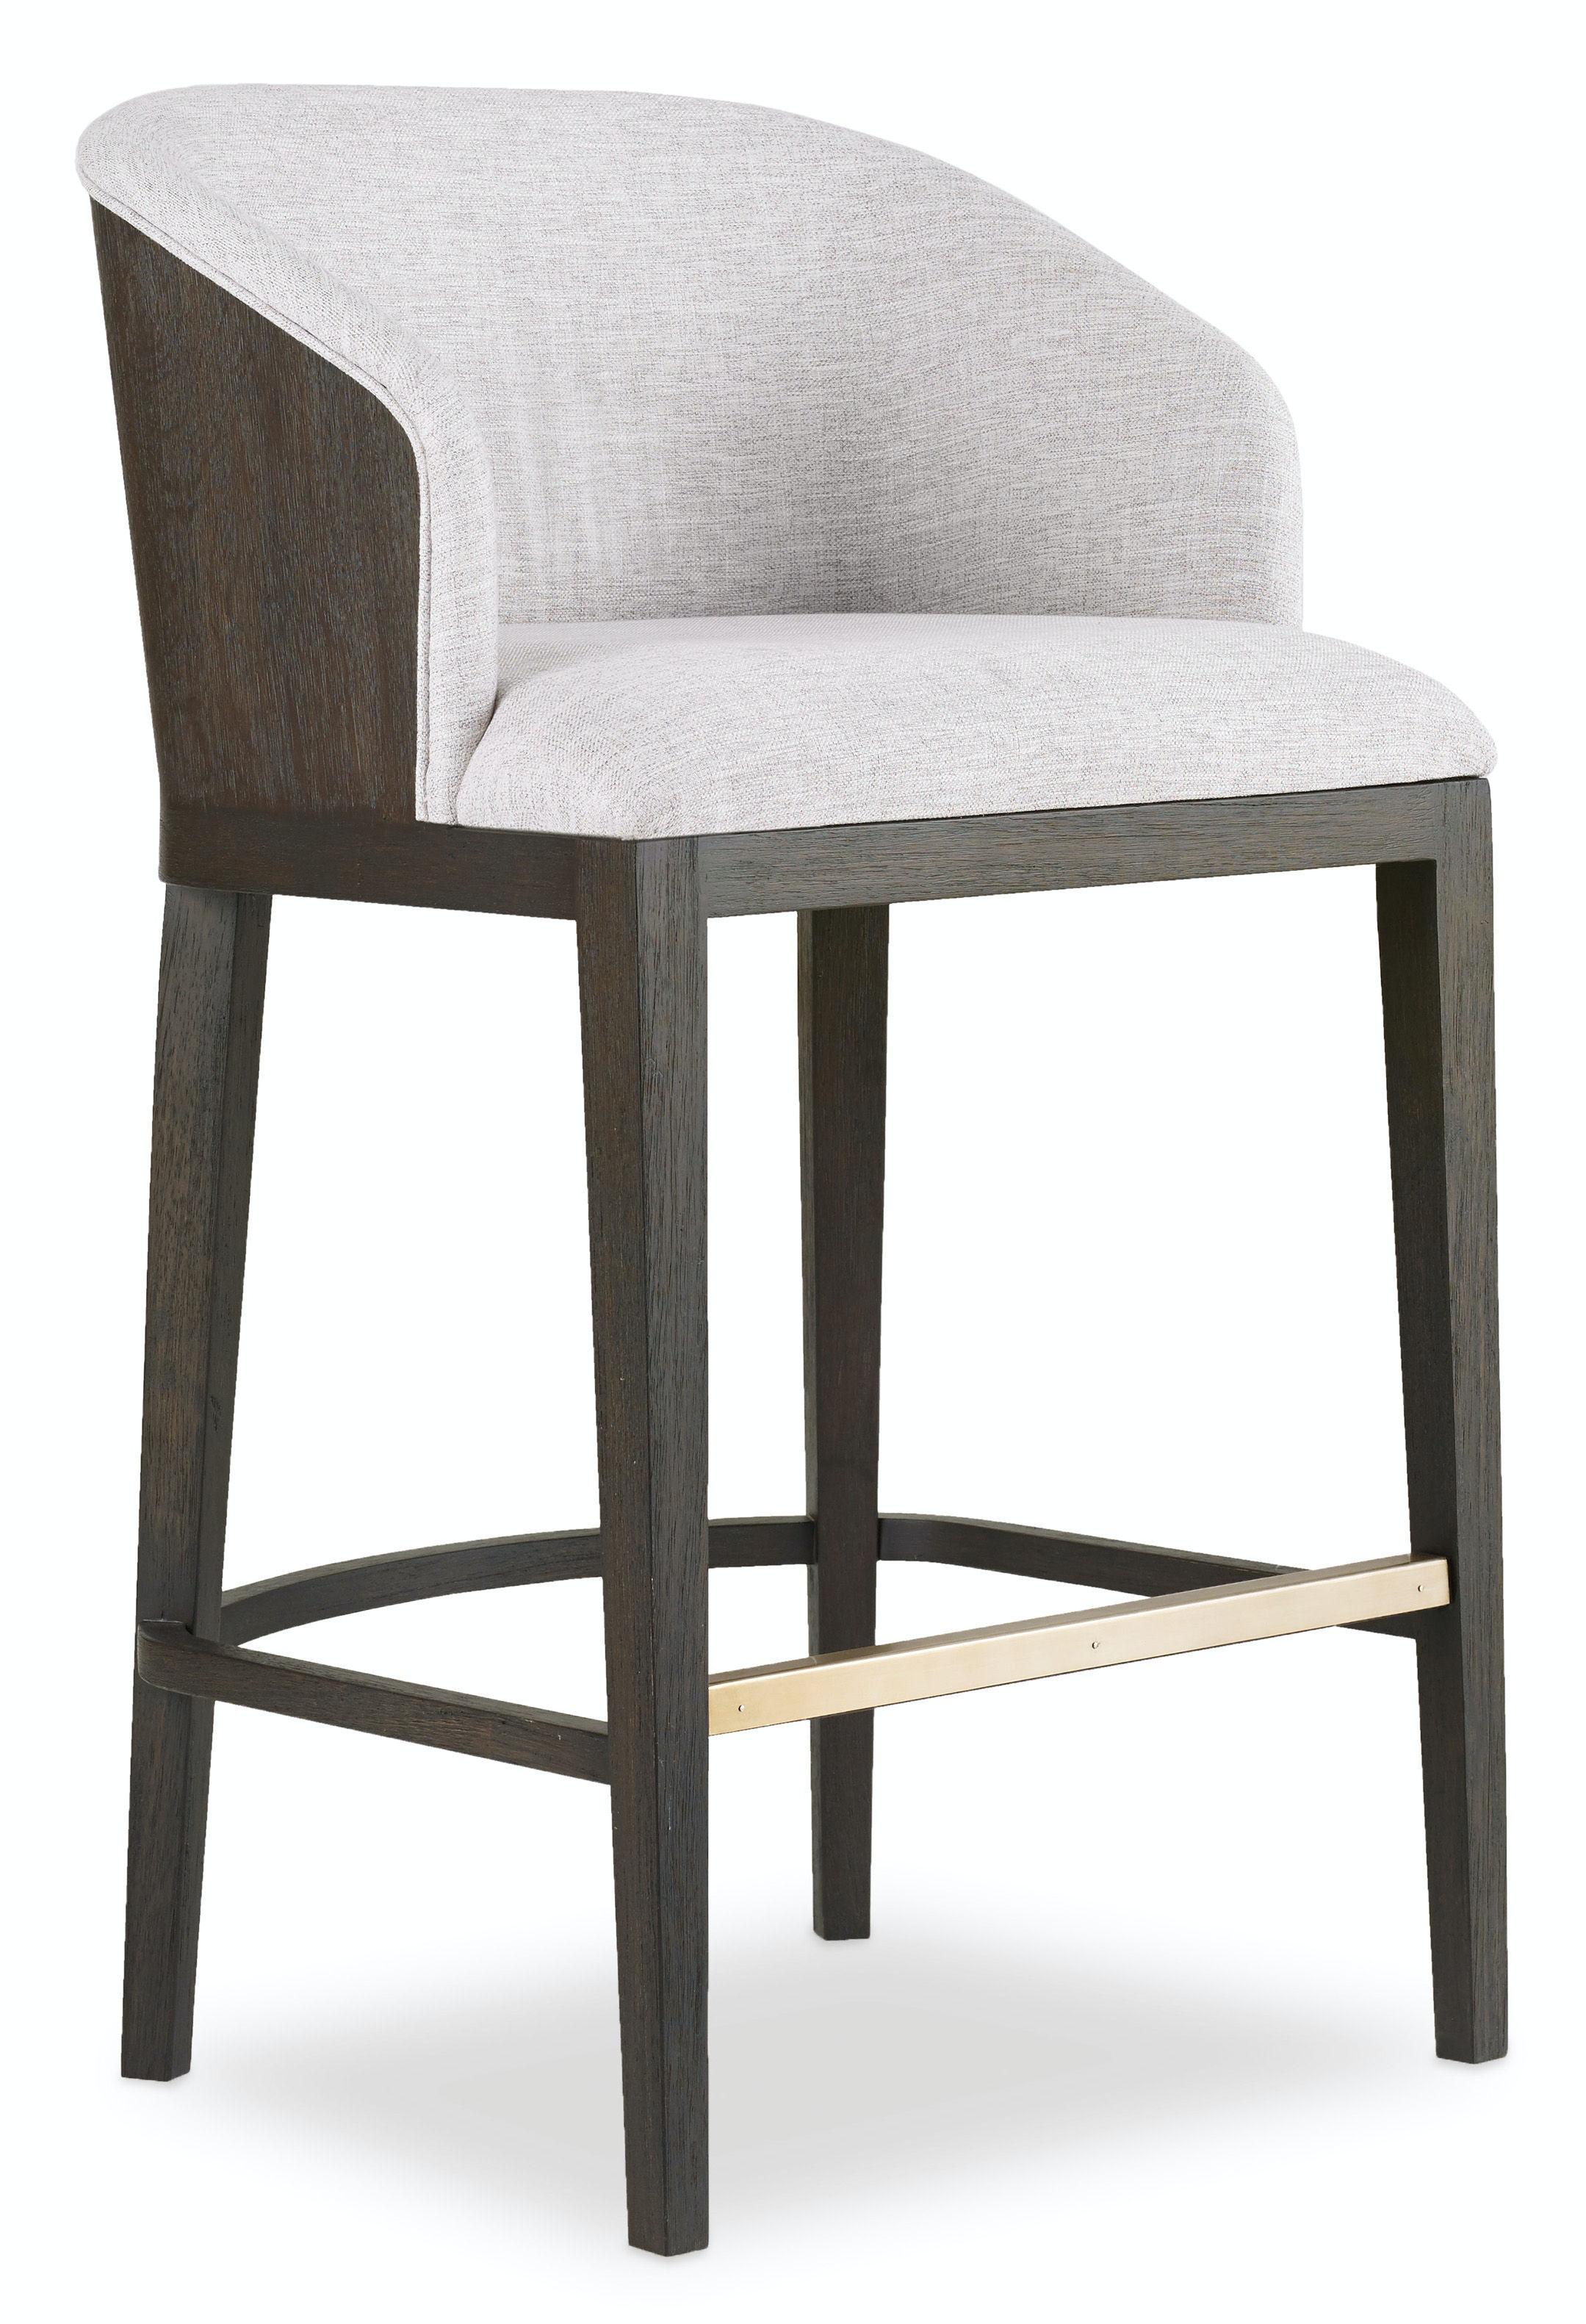 upholstered bar stools. Hooker Furniture Curata Upholstered Bar Stool 1600-20860-DKW Stools S